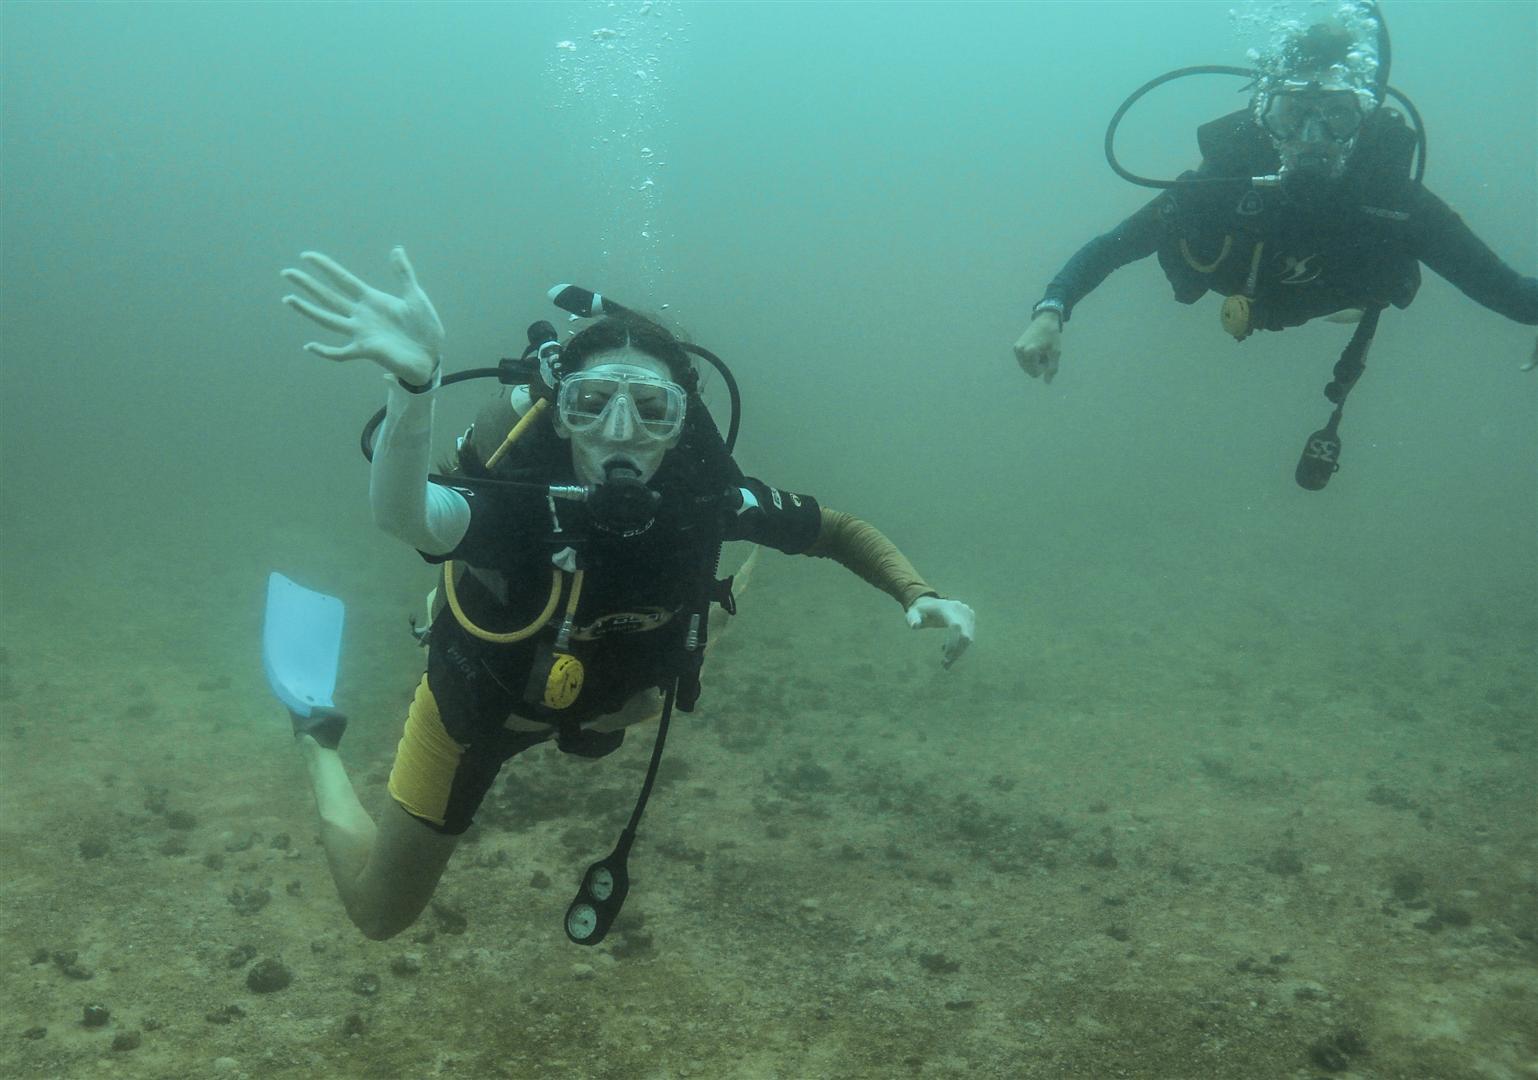 A picture of Mrs. McQuain on a scuba diving trip.